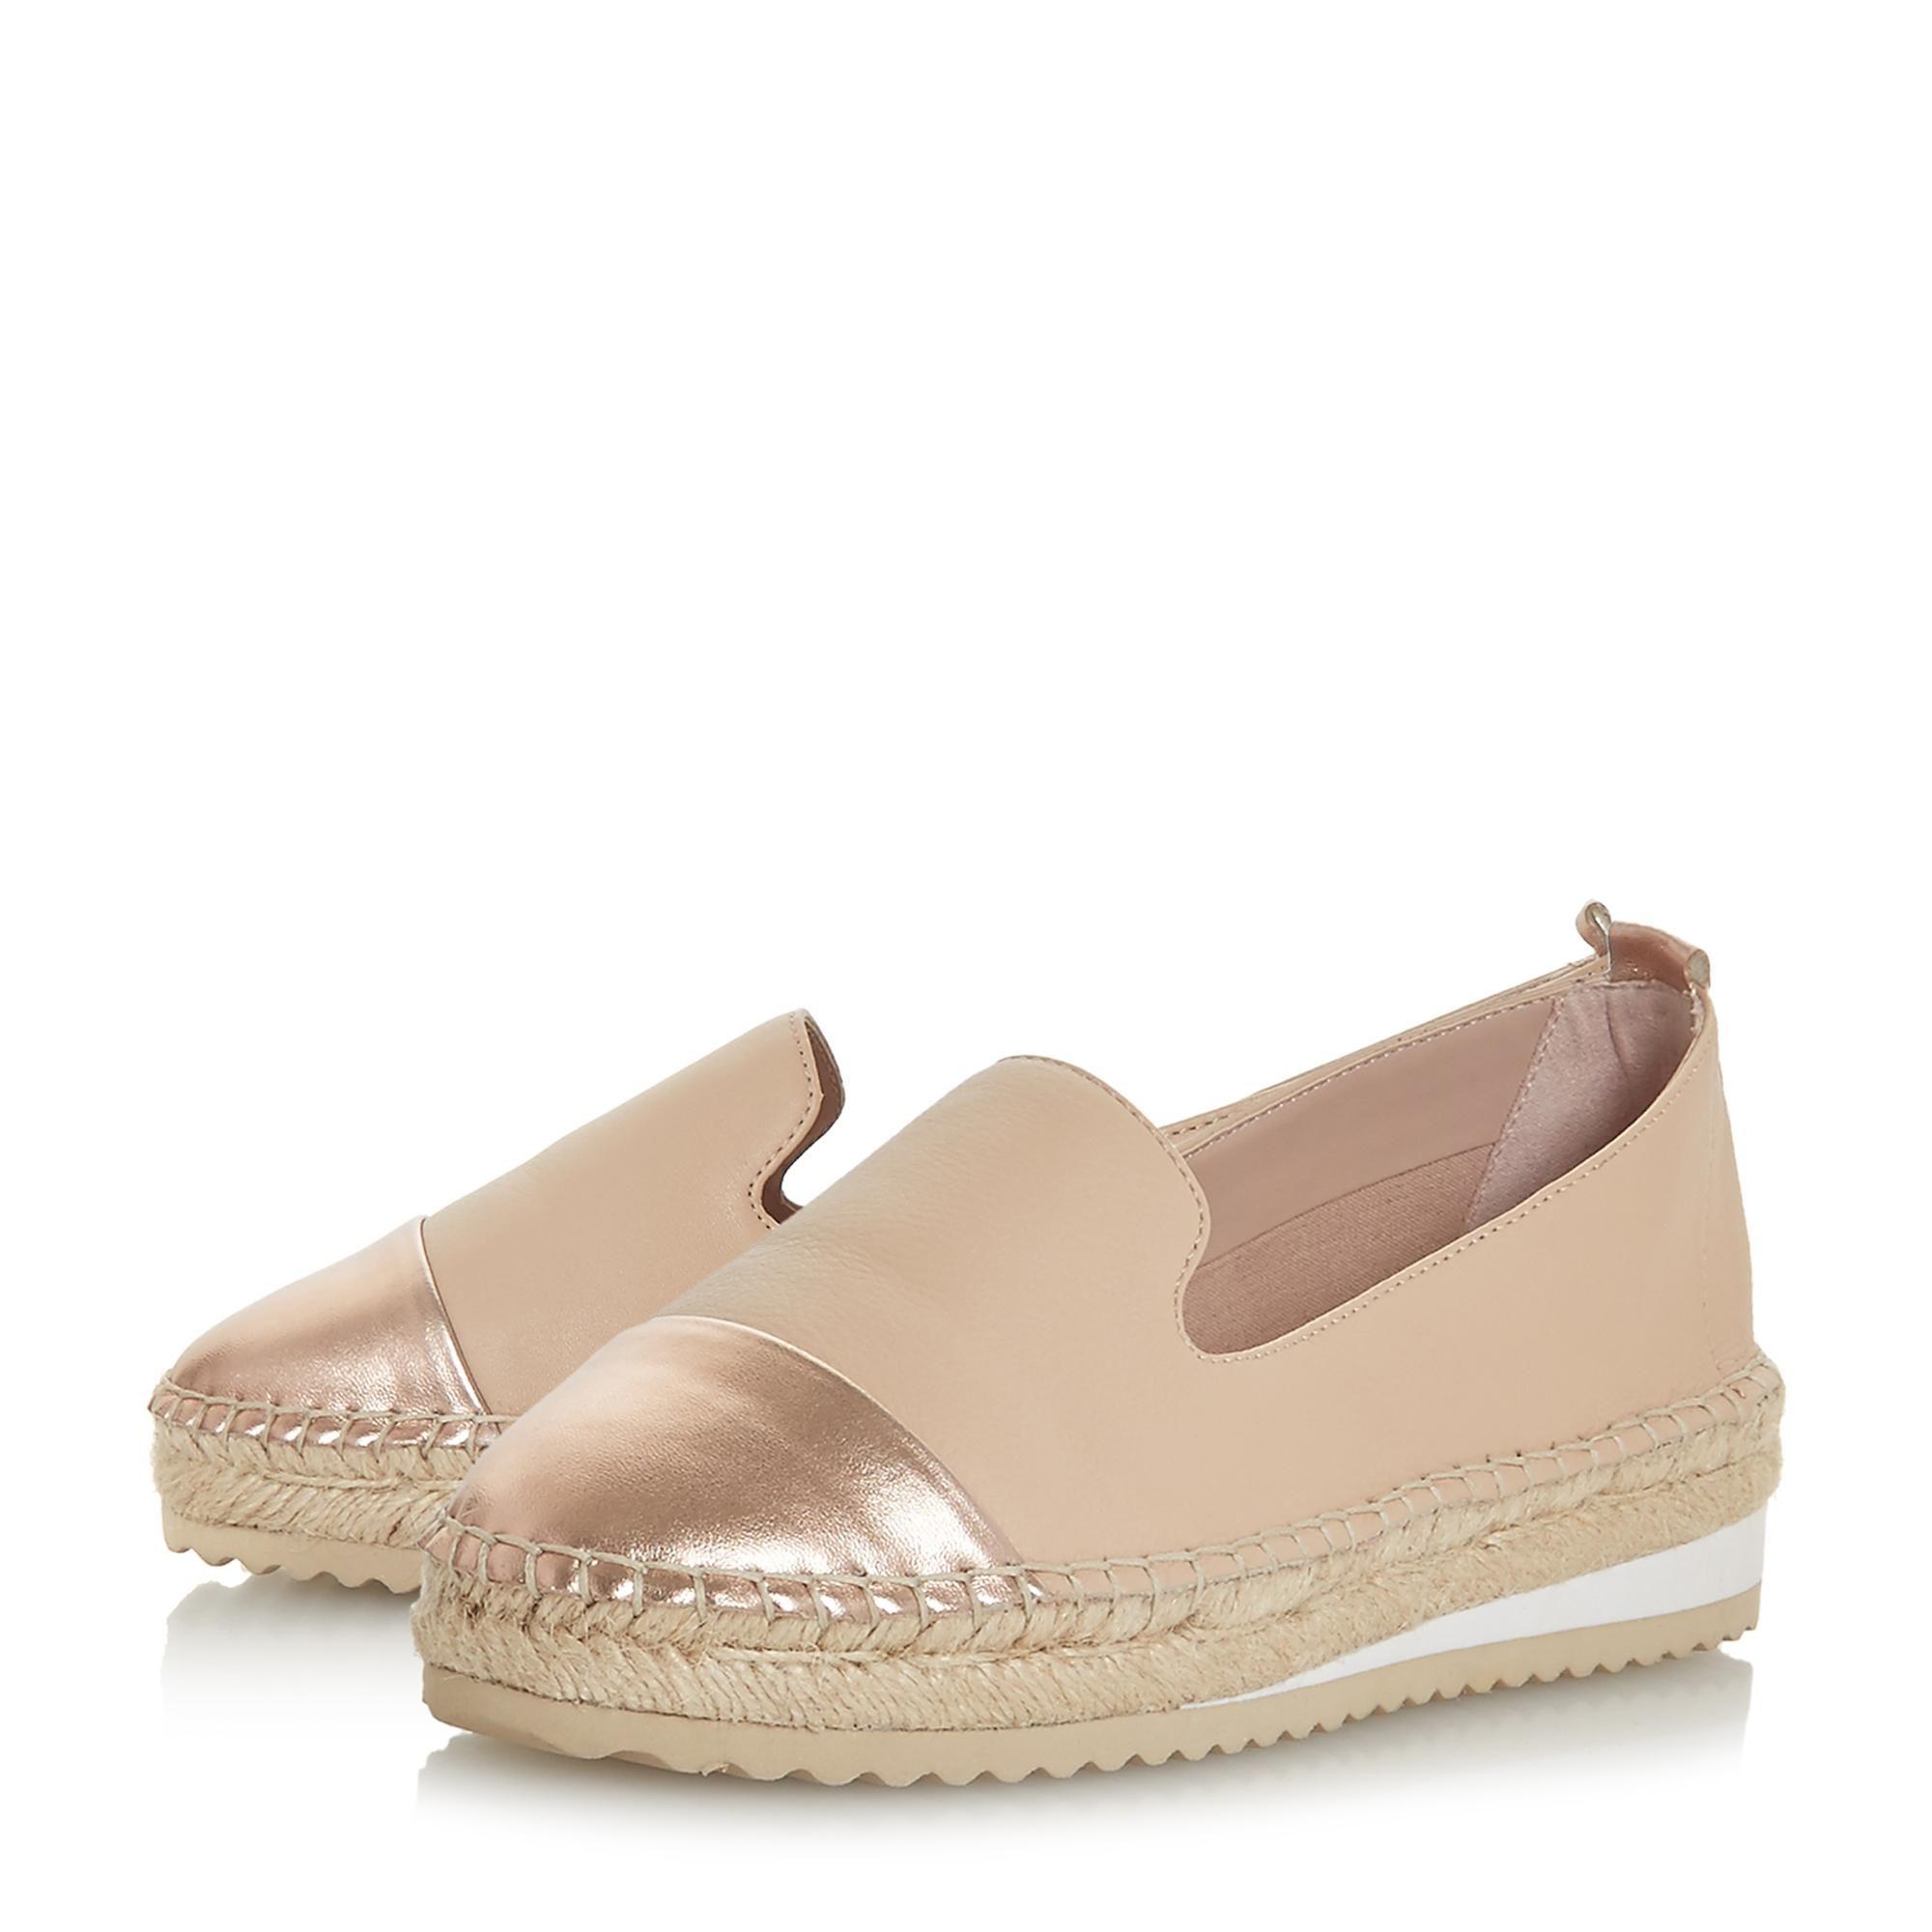 Slip on Shoe with Espadrille Sole and Metallic Toe Cap - Pink Dune London 4rLXYQ